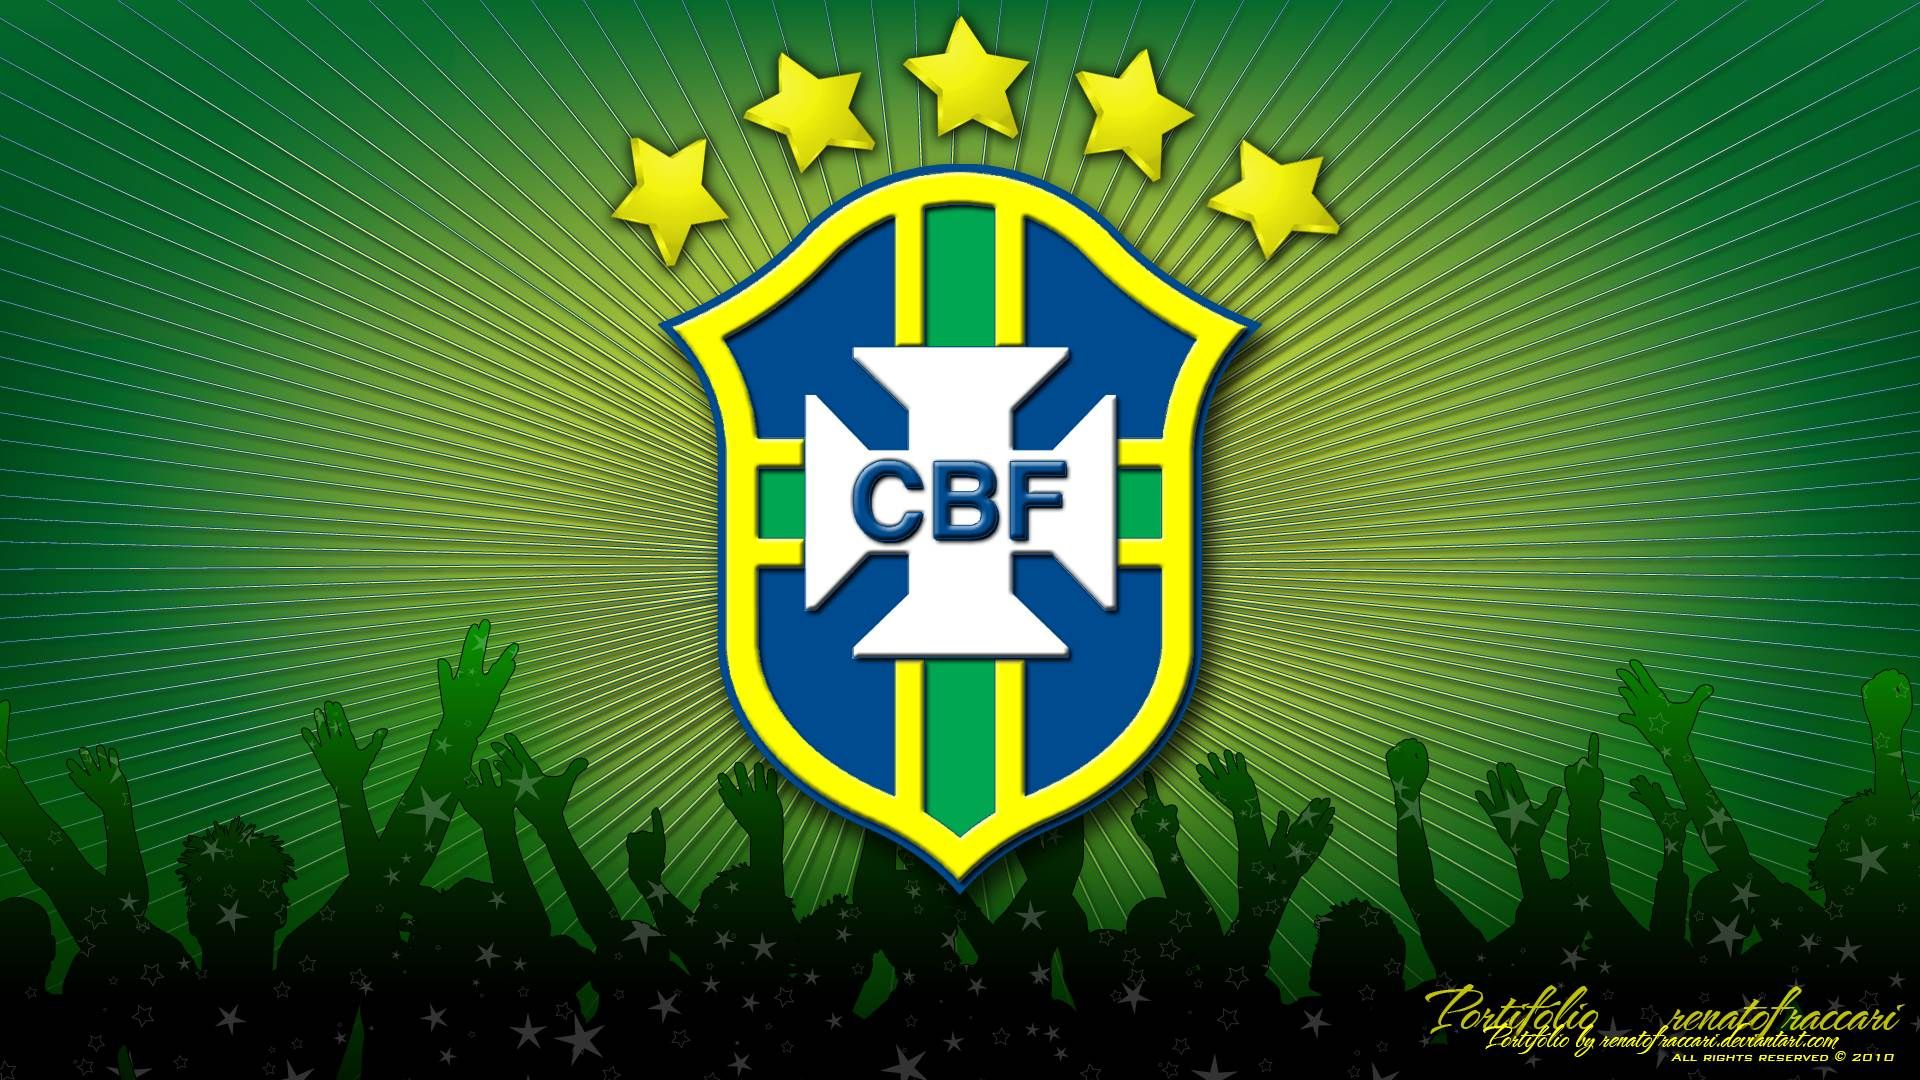 Brazil Wallpaper Hd Pixels Talk 1920 1080 Brazil Wallpaper Adorable Wallpapers Brazil Football Team Football Wallpaper Brazil Wallpaper